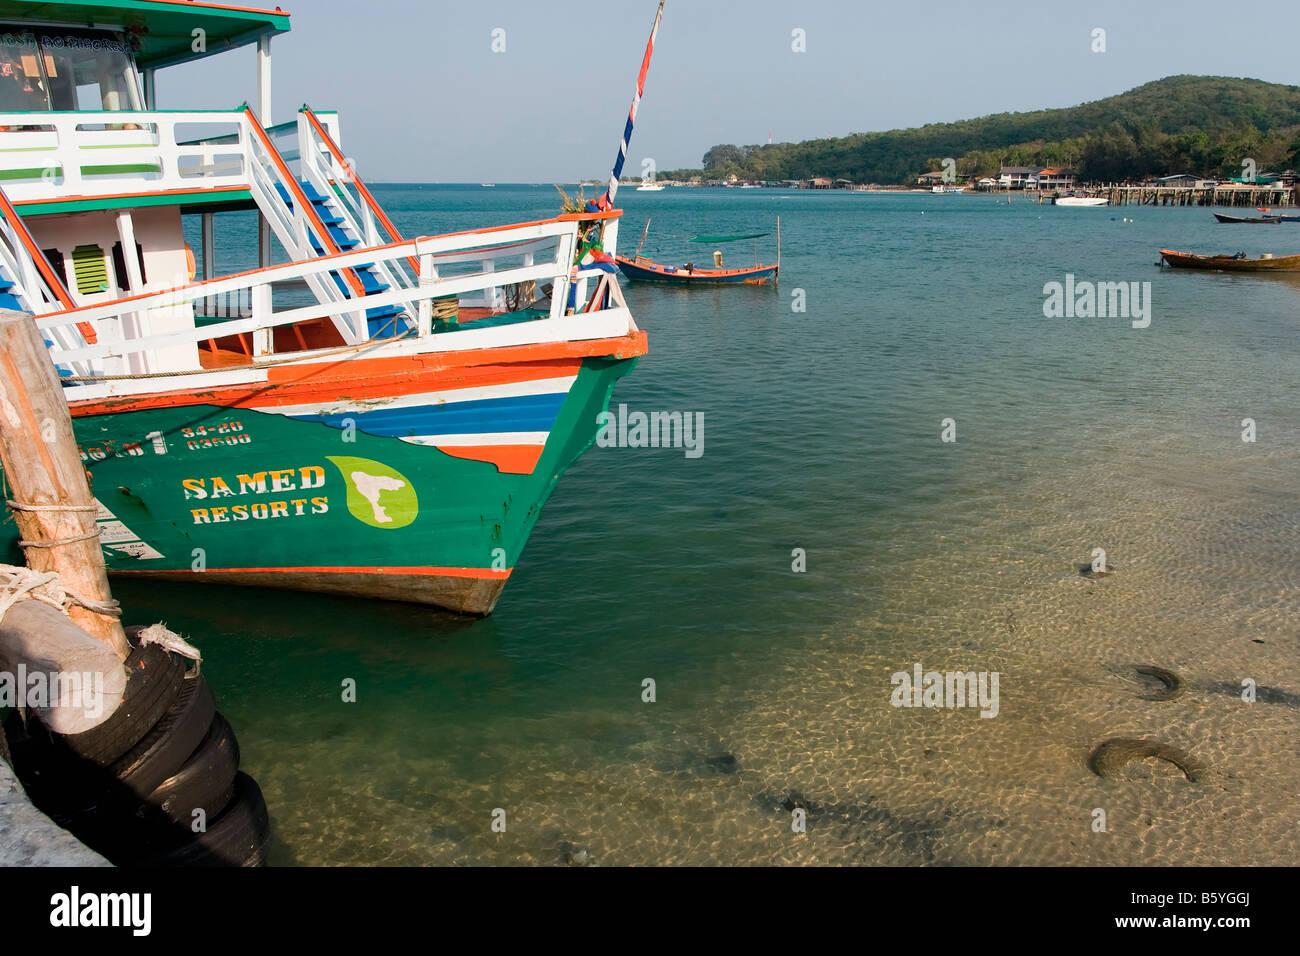 Thailand Koh Samet Sa Med boat - Stock Image